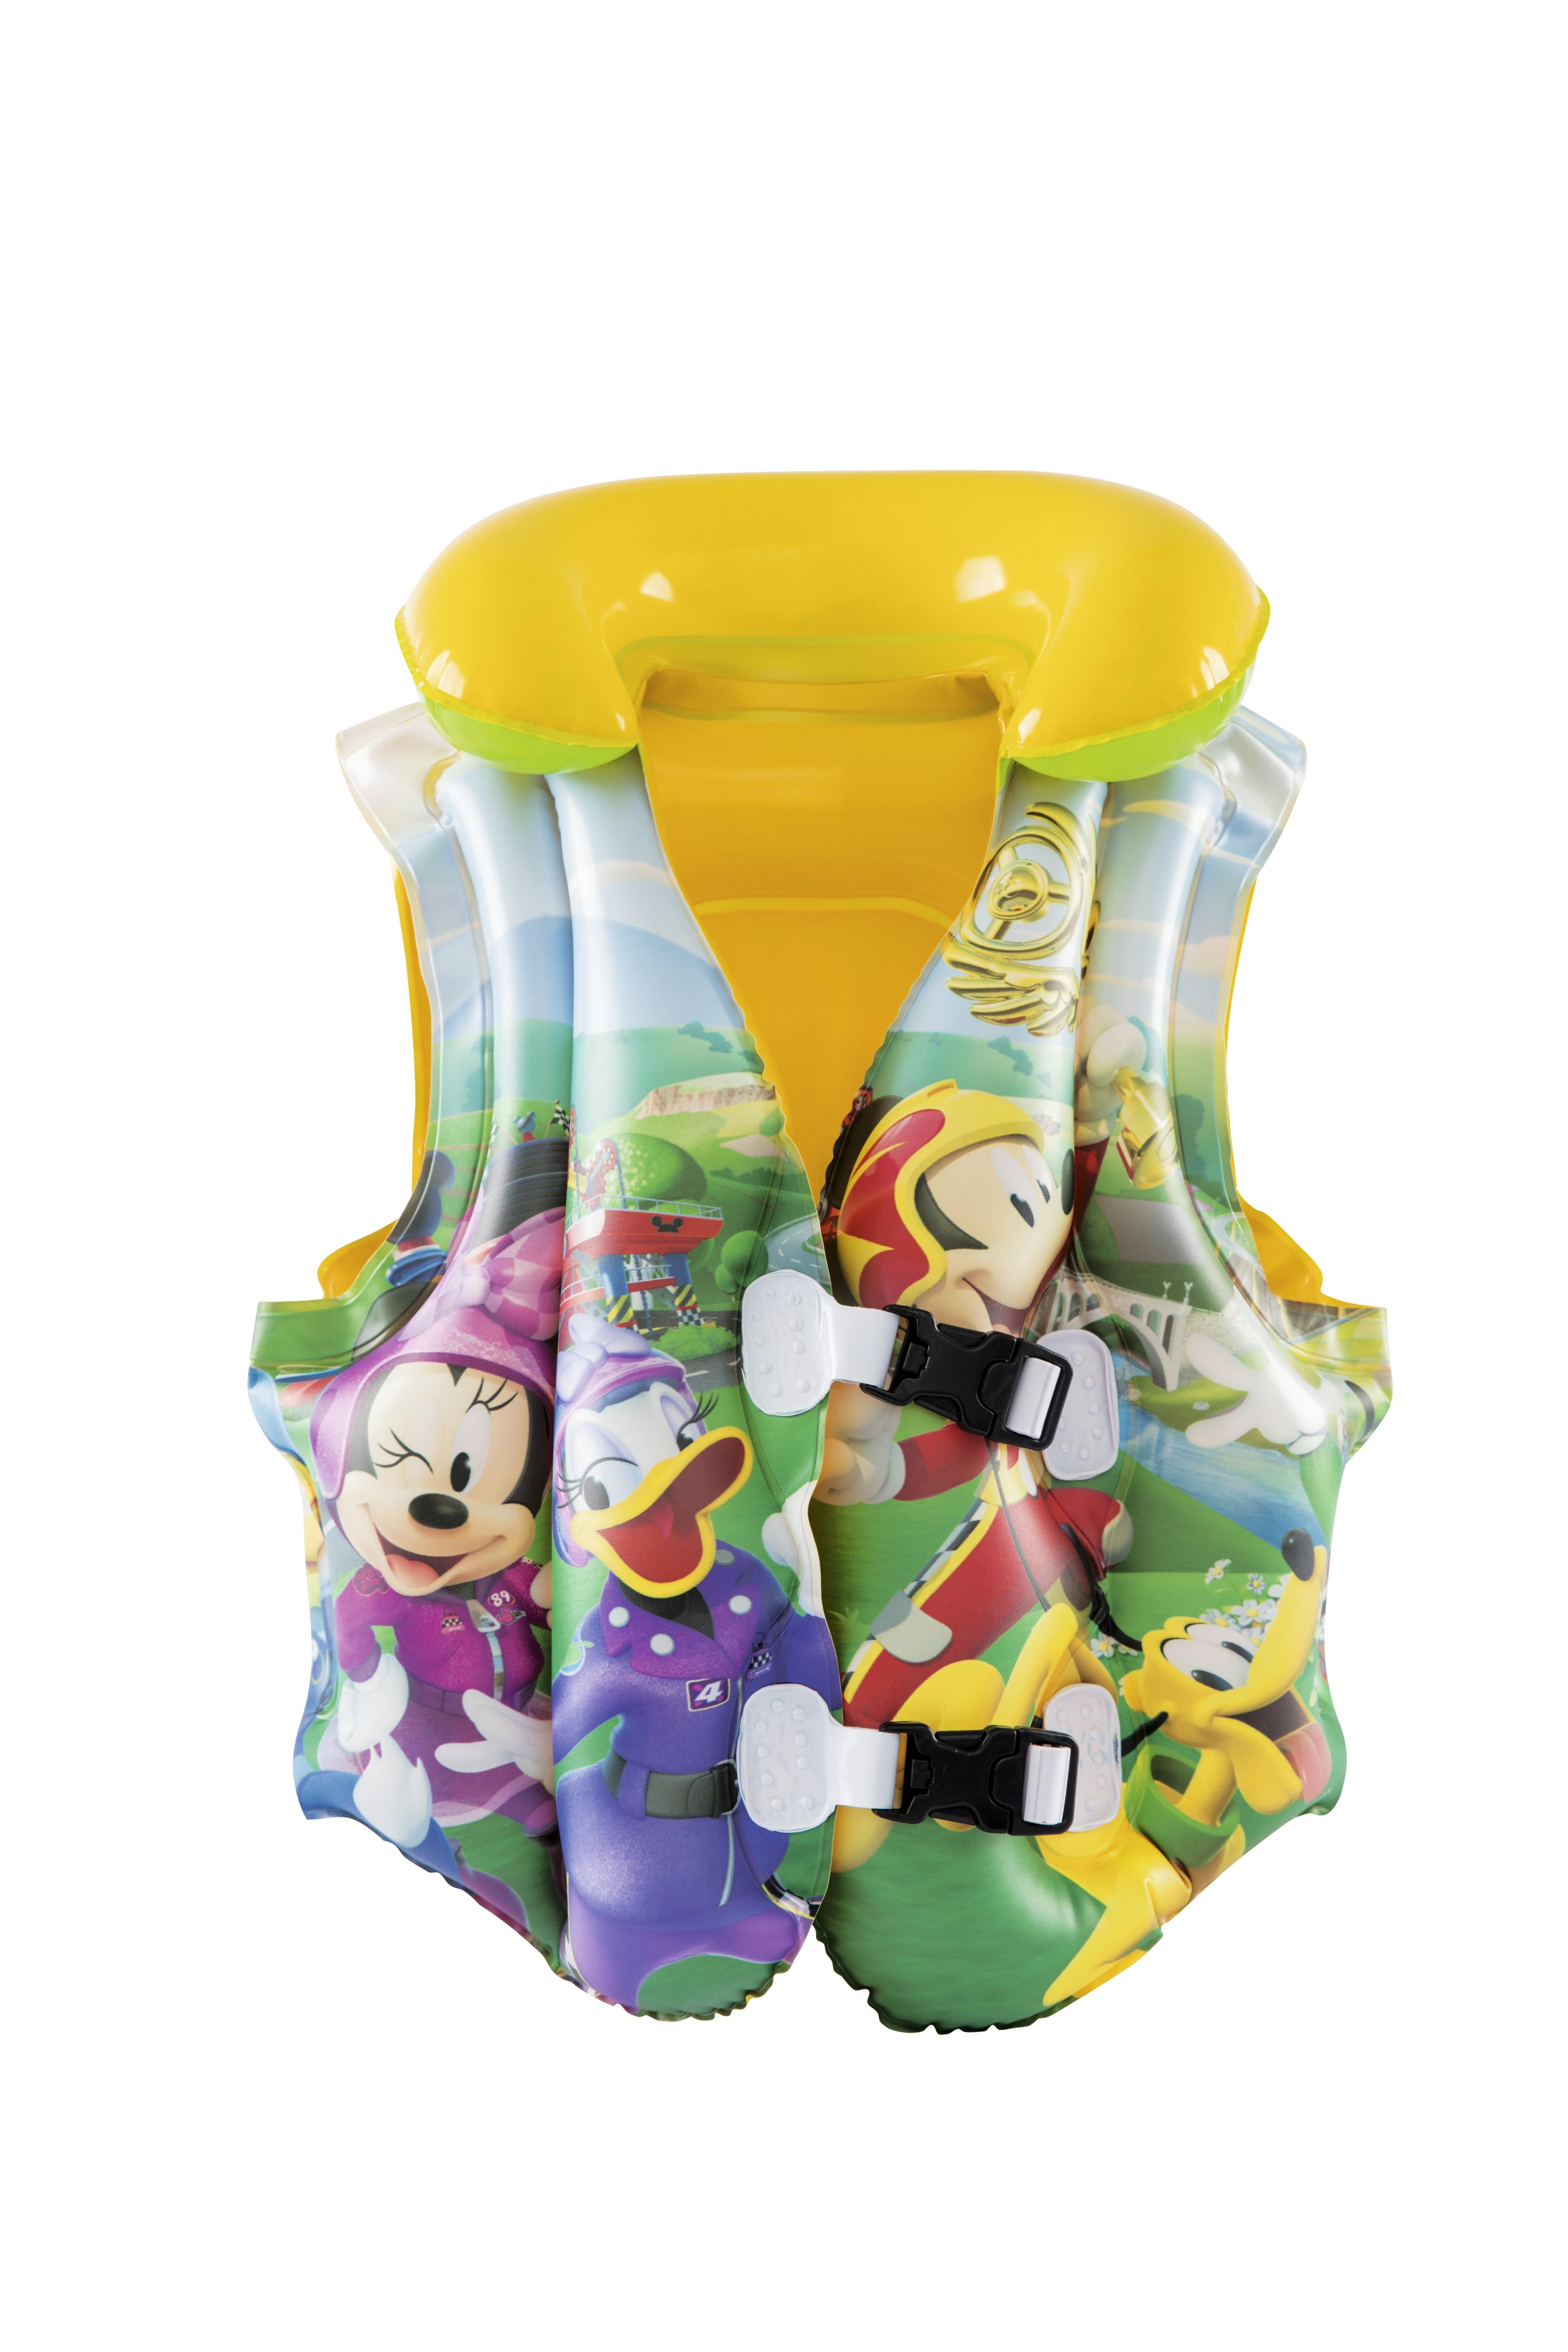 Vest Inflatable Swimming 51 х46 Cm, Bestway, Item No. 91030